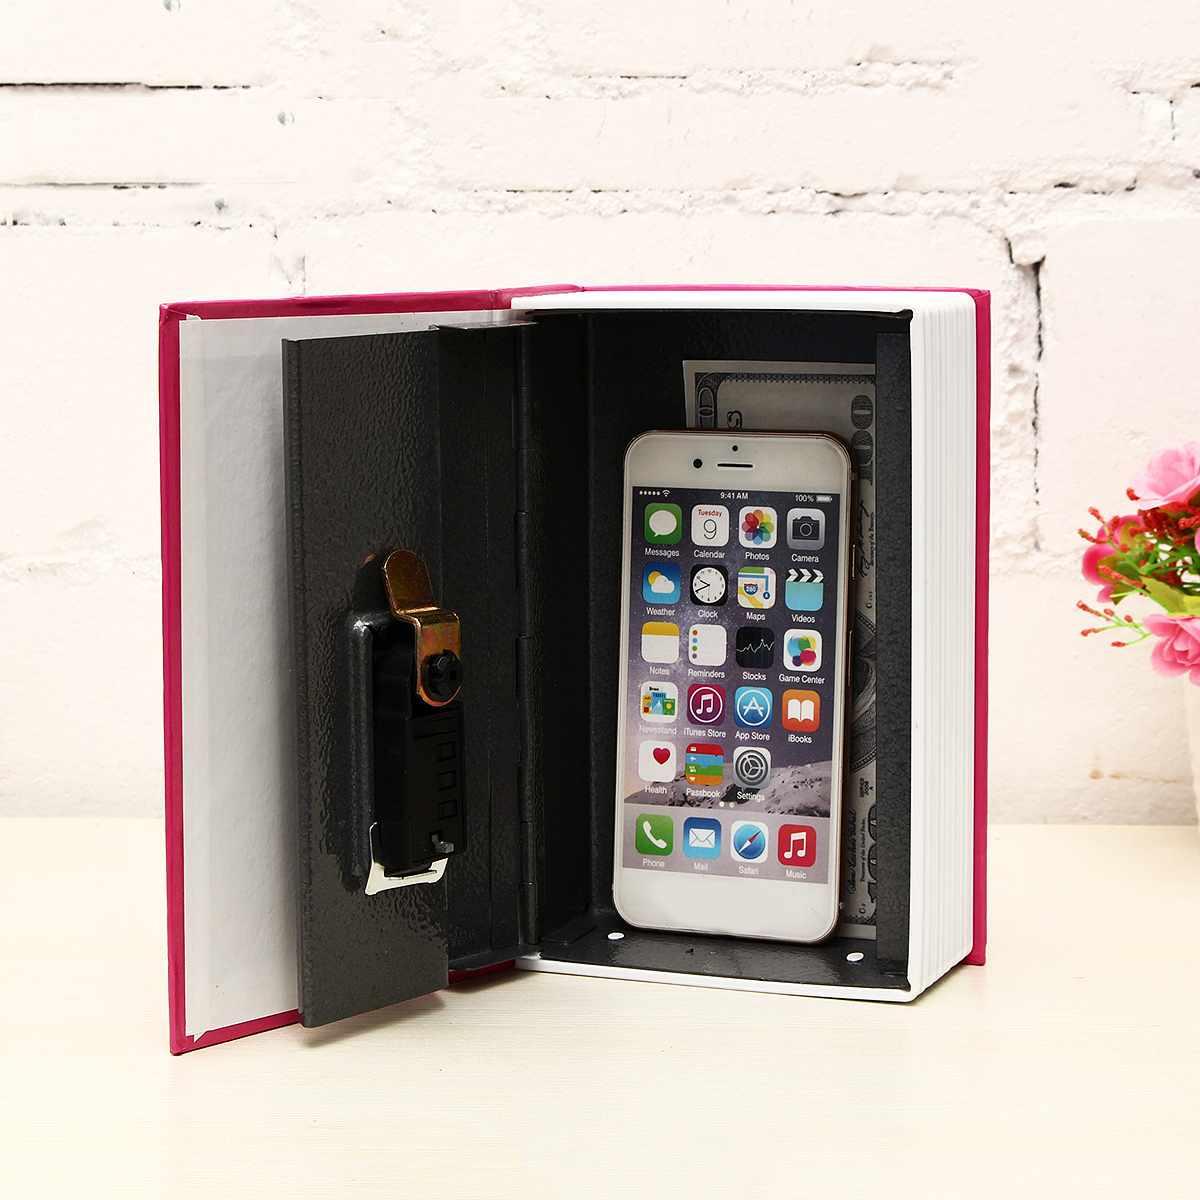 18x11.5x5.5cm Password Safe Deposit Box Mini Home Storage Box Crafts Book Secret Security Safe Lock Cash Money Coin Storage